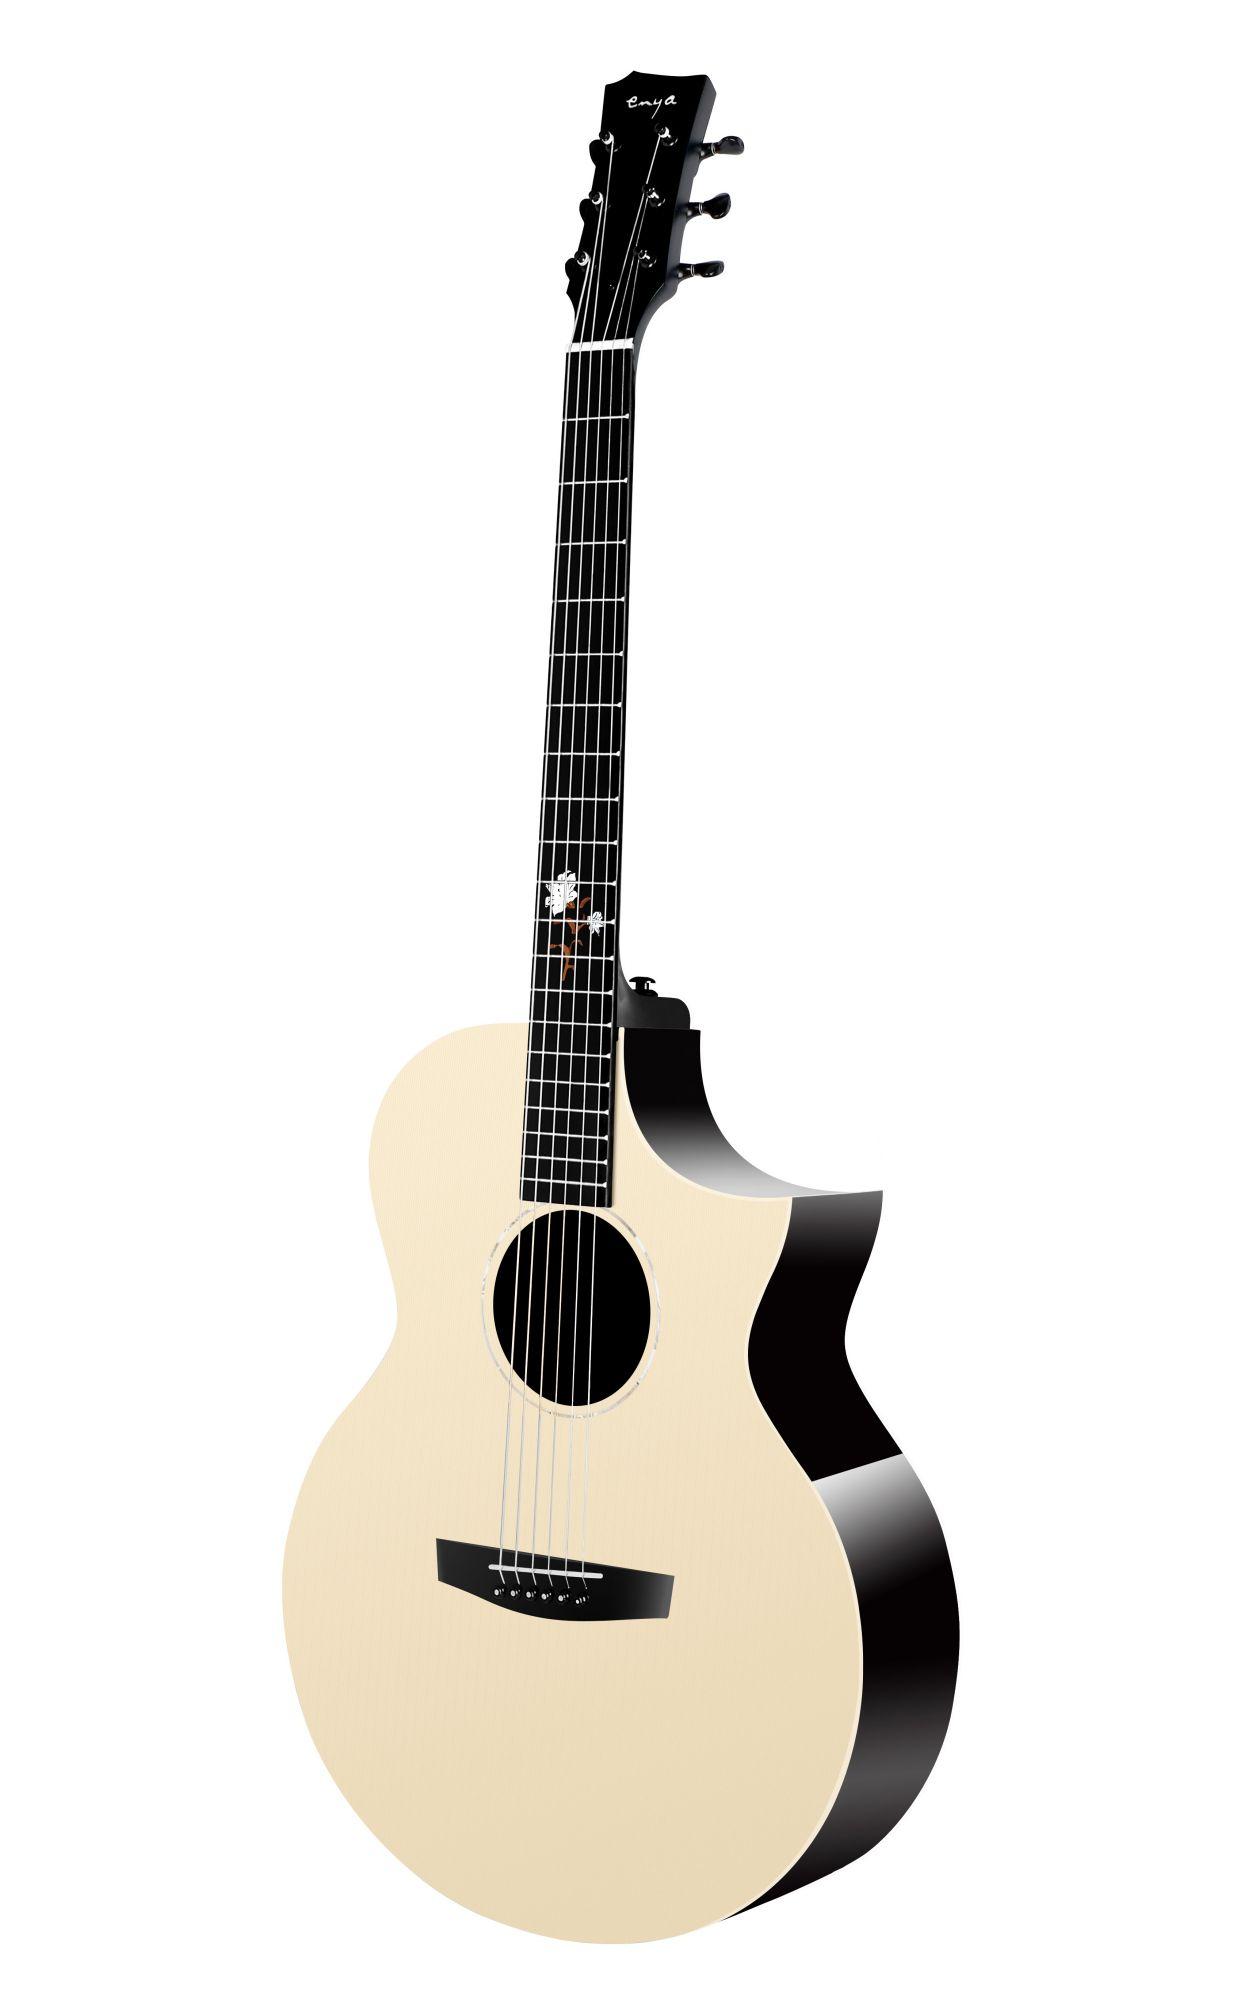 Enya EA-X2C PRO EQ  TransAcoustic Guitar- Natural Glossy Finish